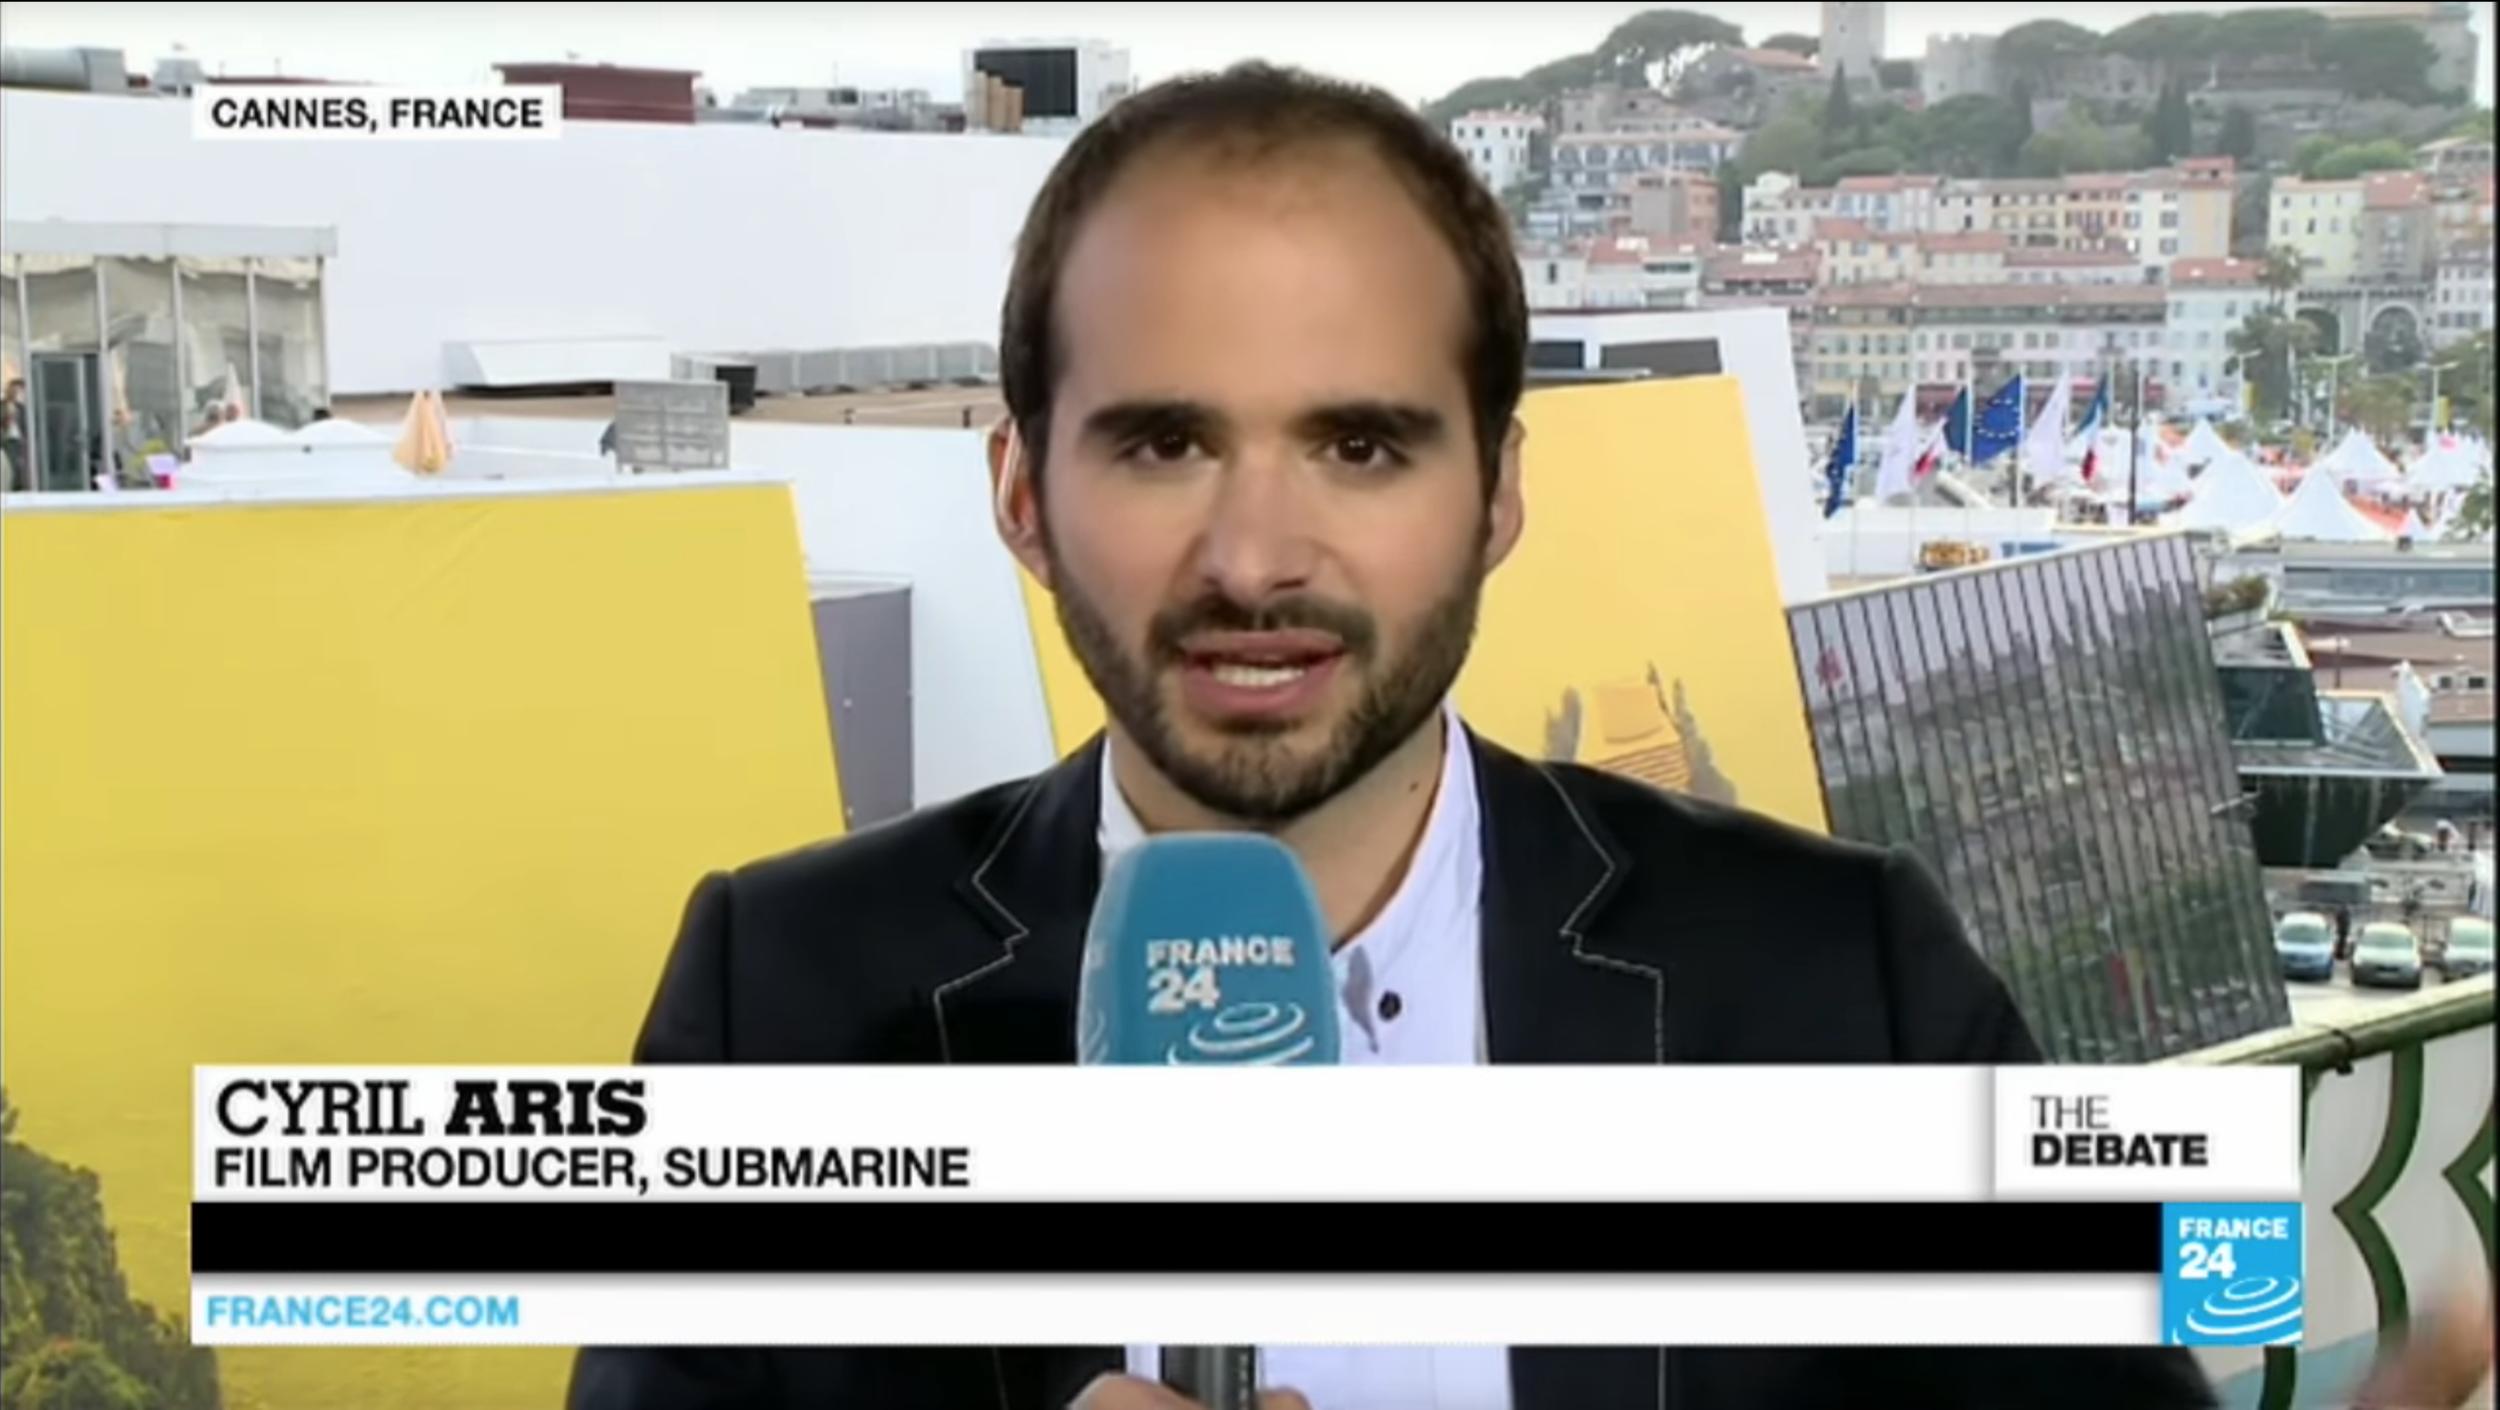 CyrilAris_France24